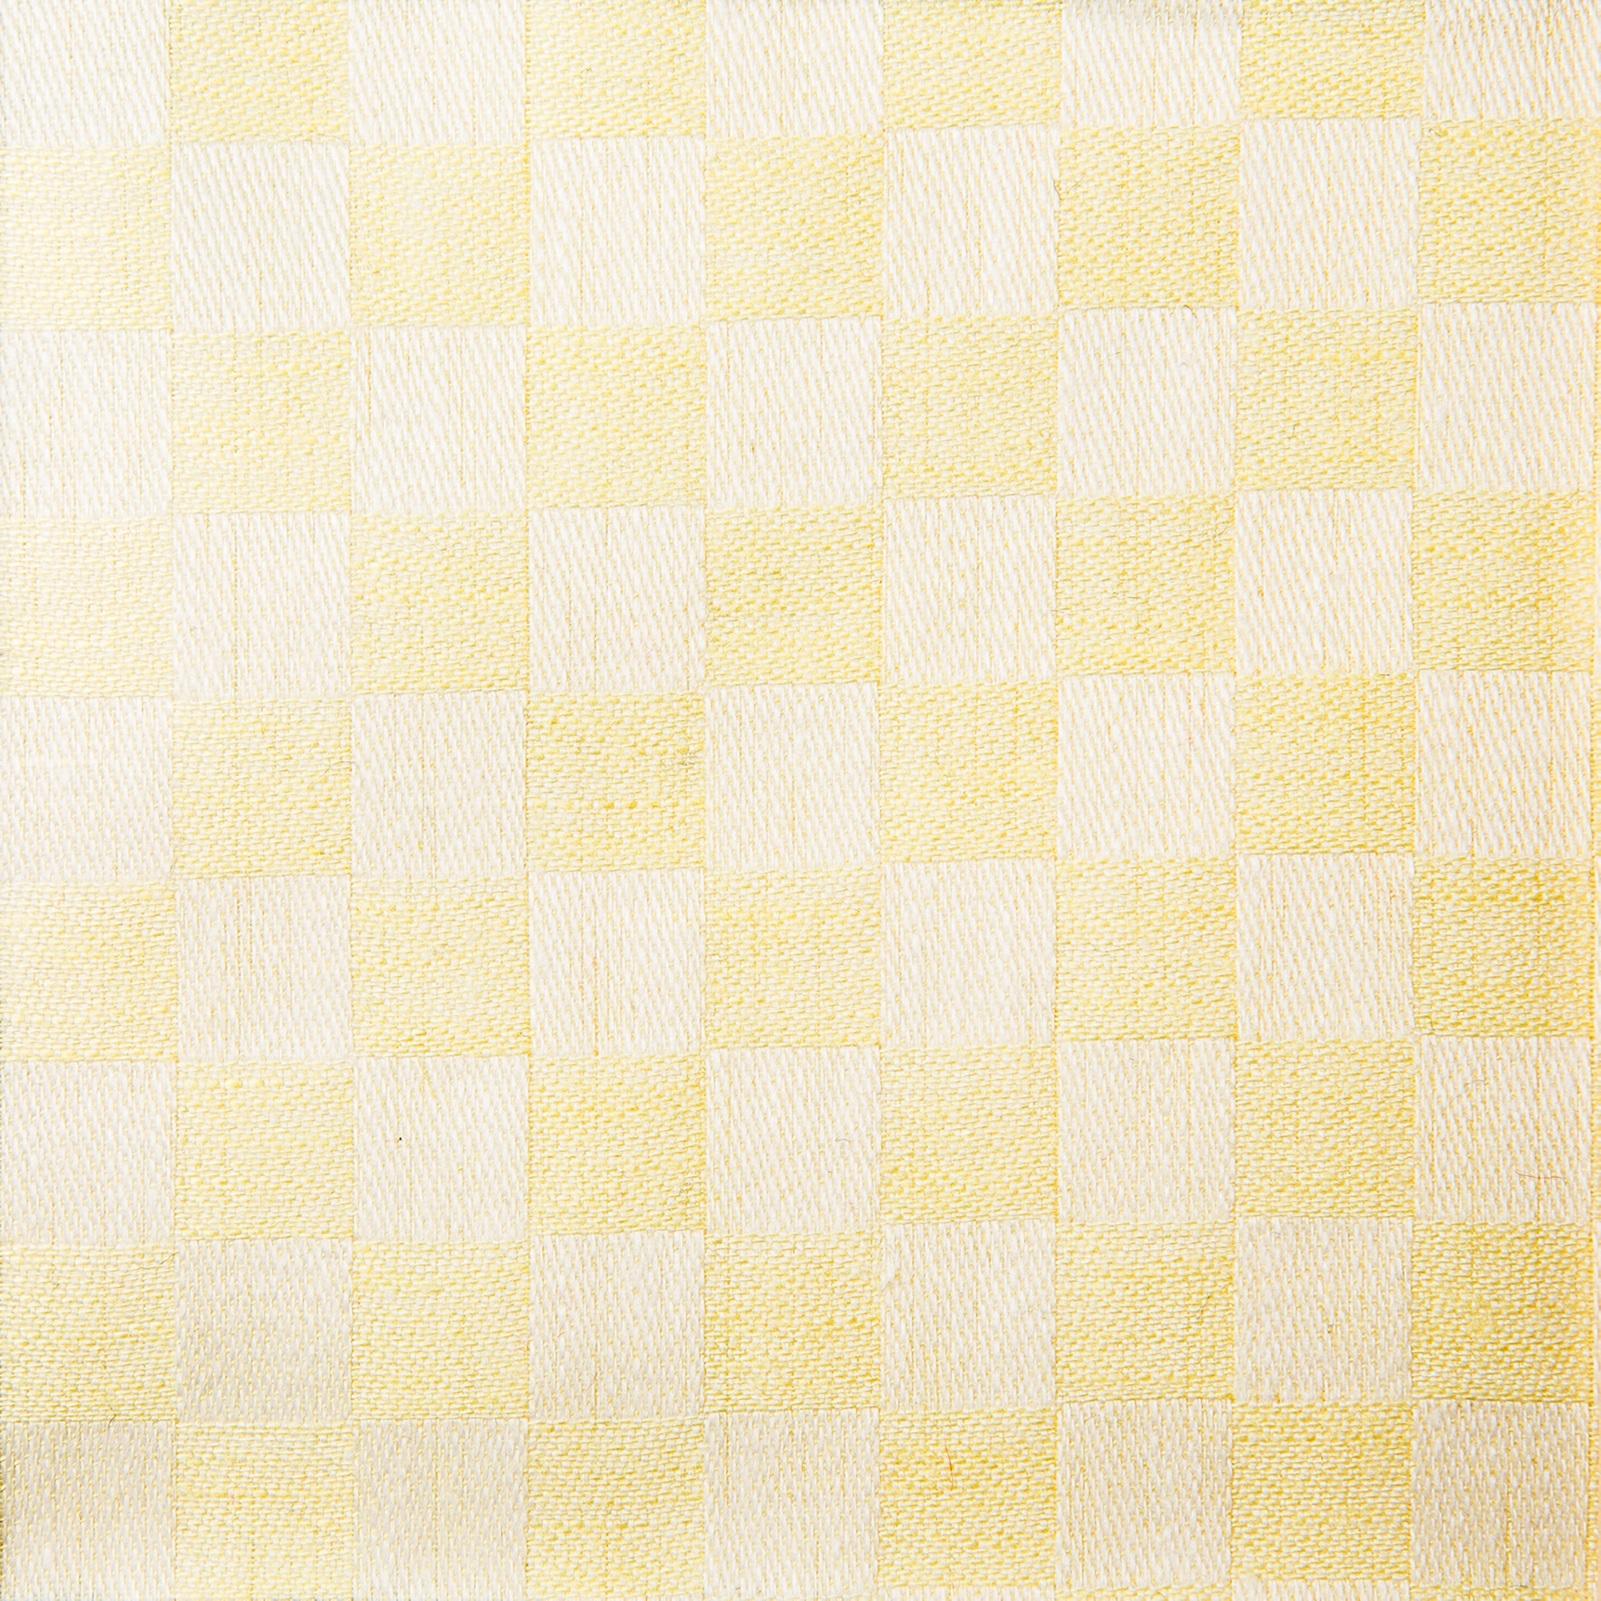 Schackrutan handduk gul